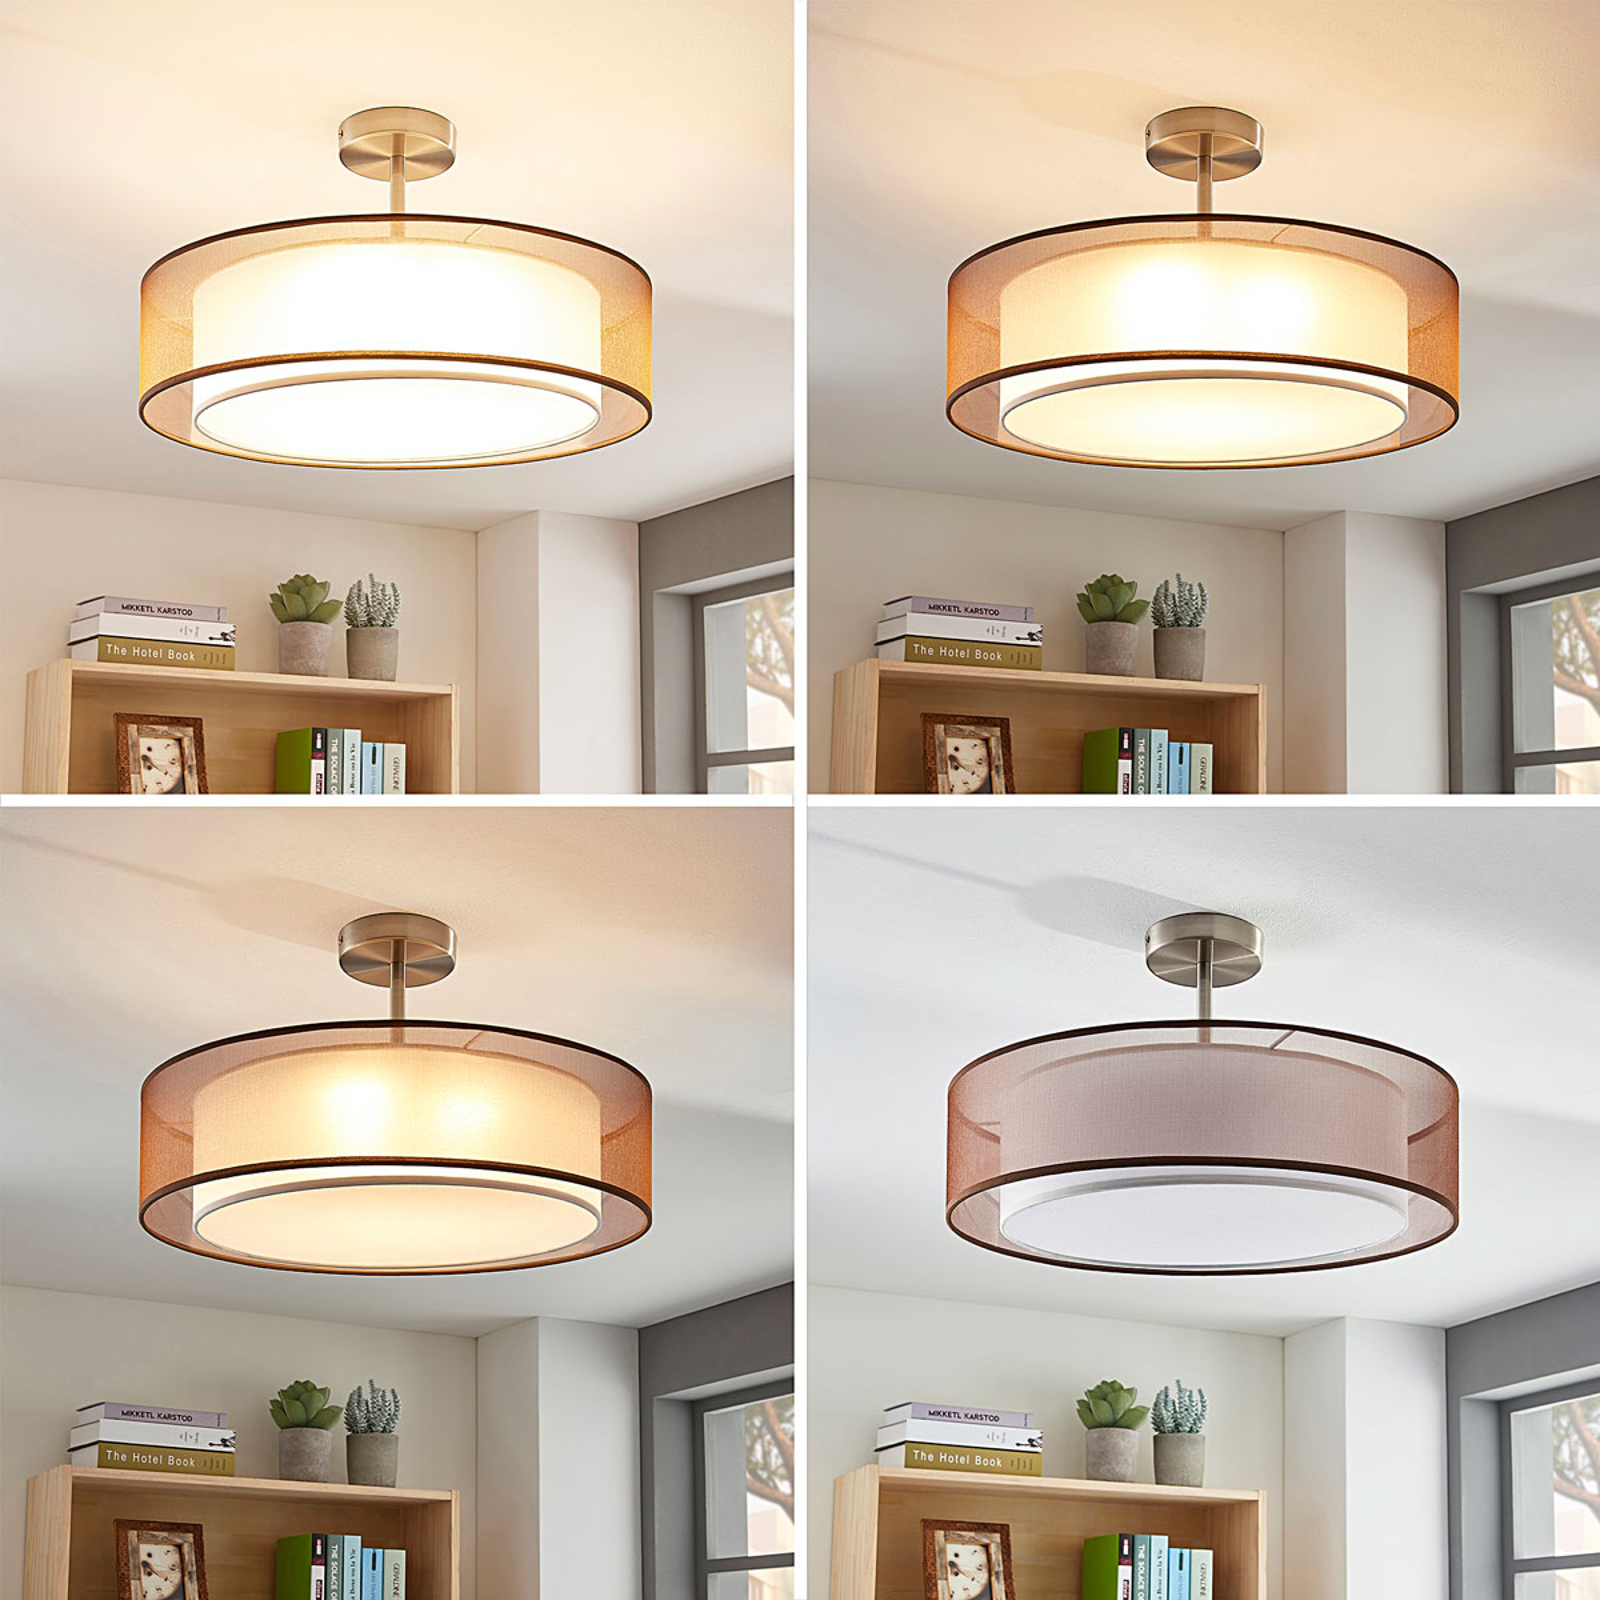 LED-Deckenlampe Pikka, 3-stufig dimmbar, braun